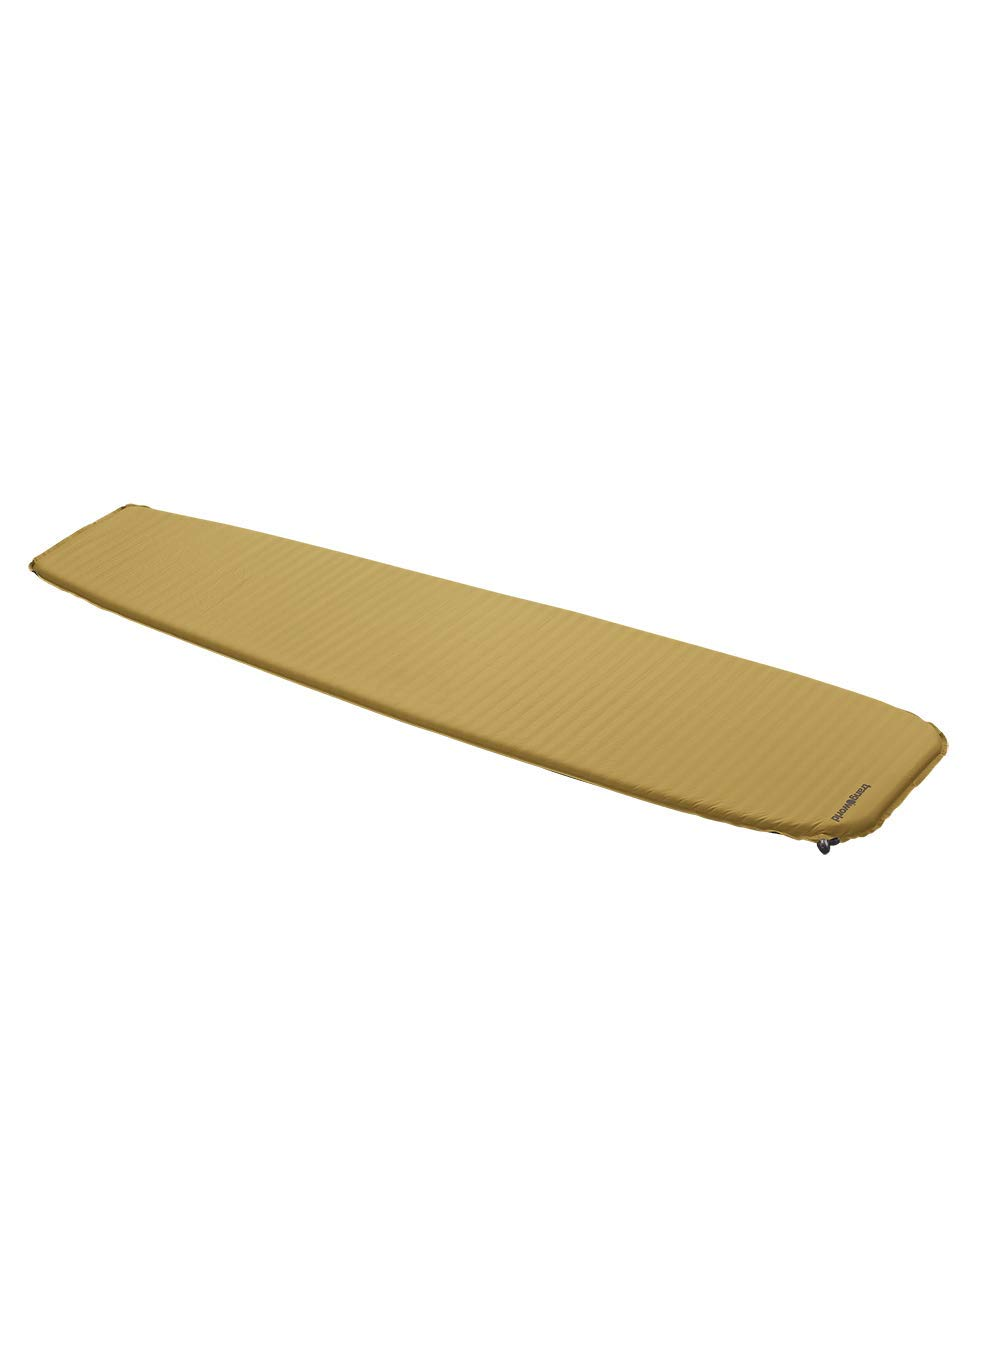 Trangoworld Micro Lite Matte, gelb senf/Grau, Einheitsgröße